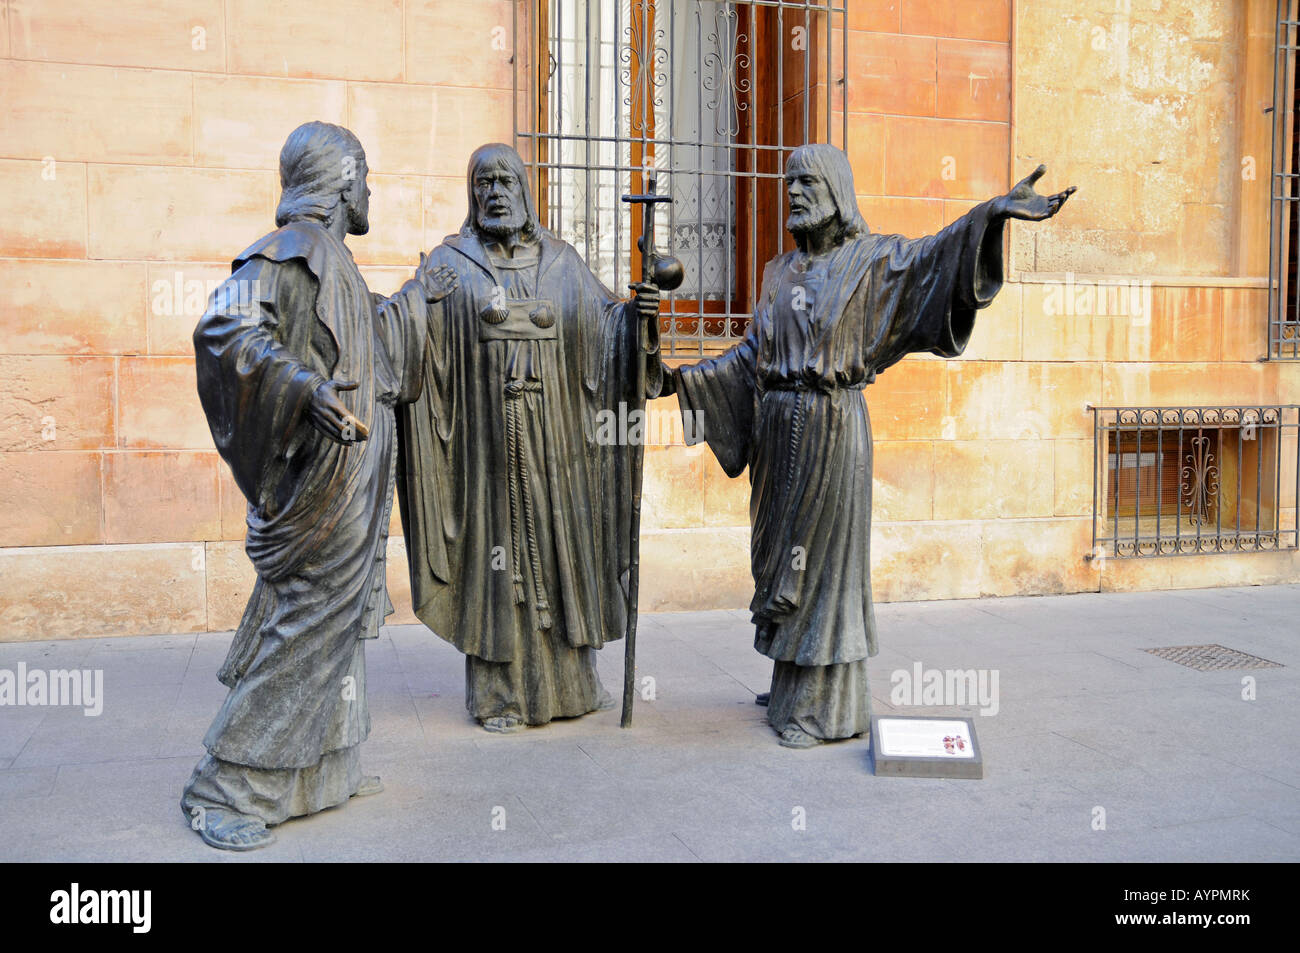 Bronze sculptures, Santa Maria Basilica, Elche, Elx, Alicante, Costa Blanca, Spain - Stock Image